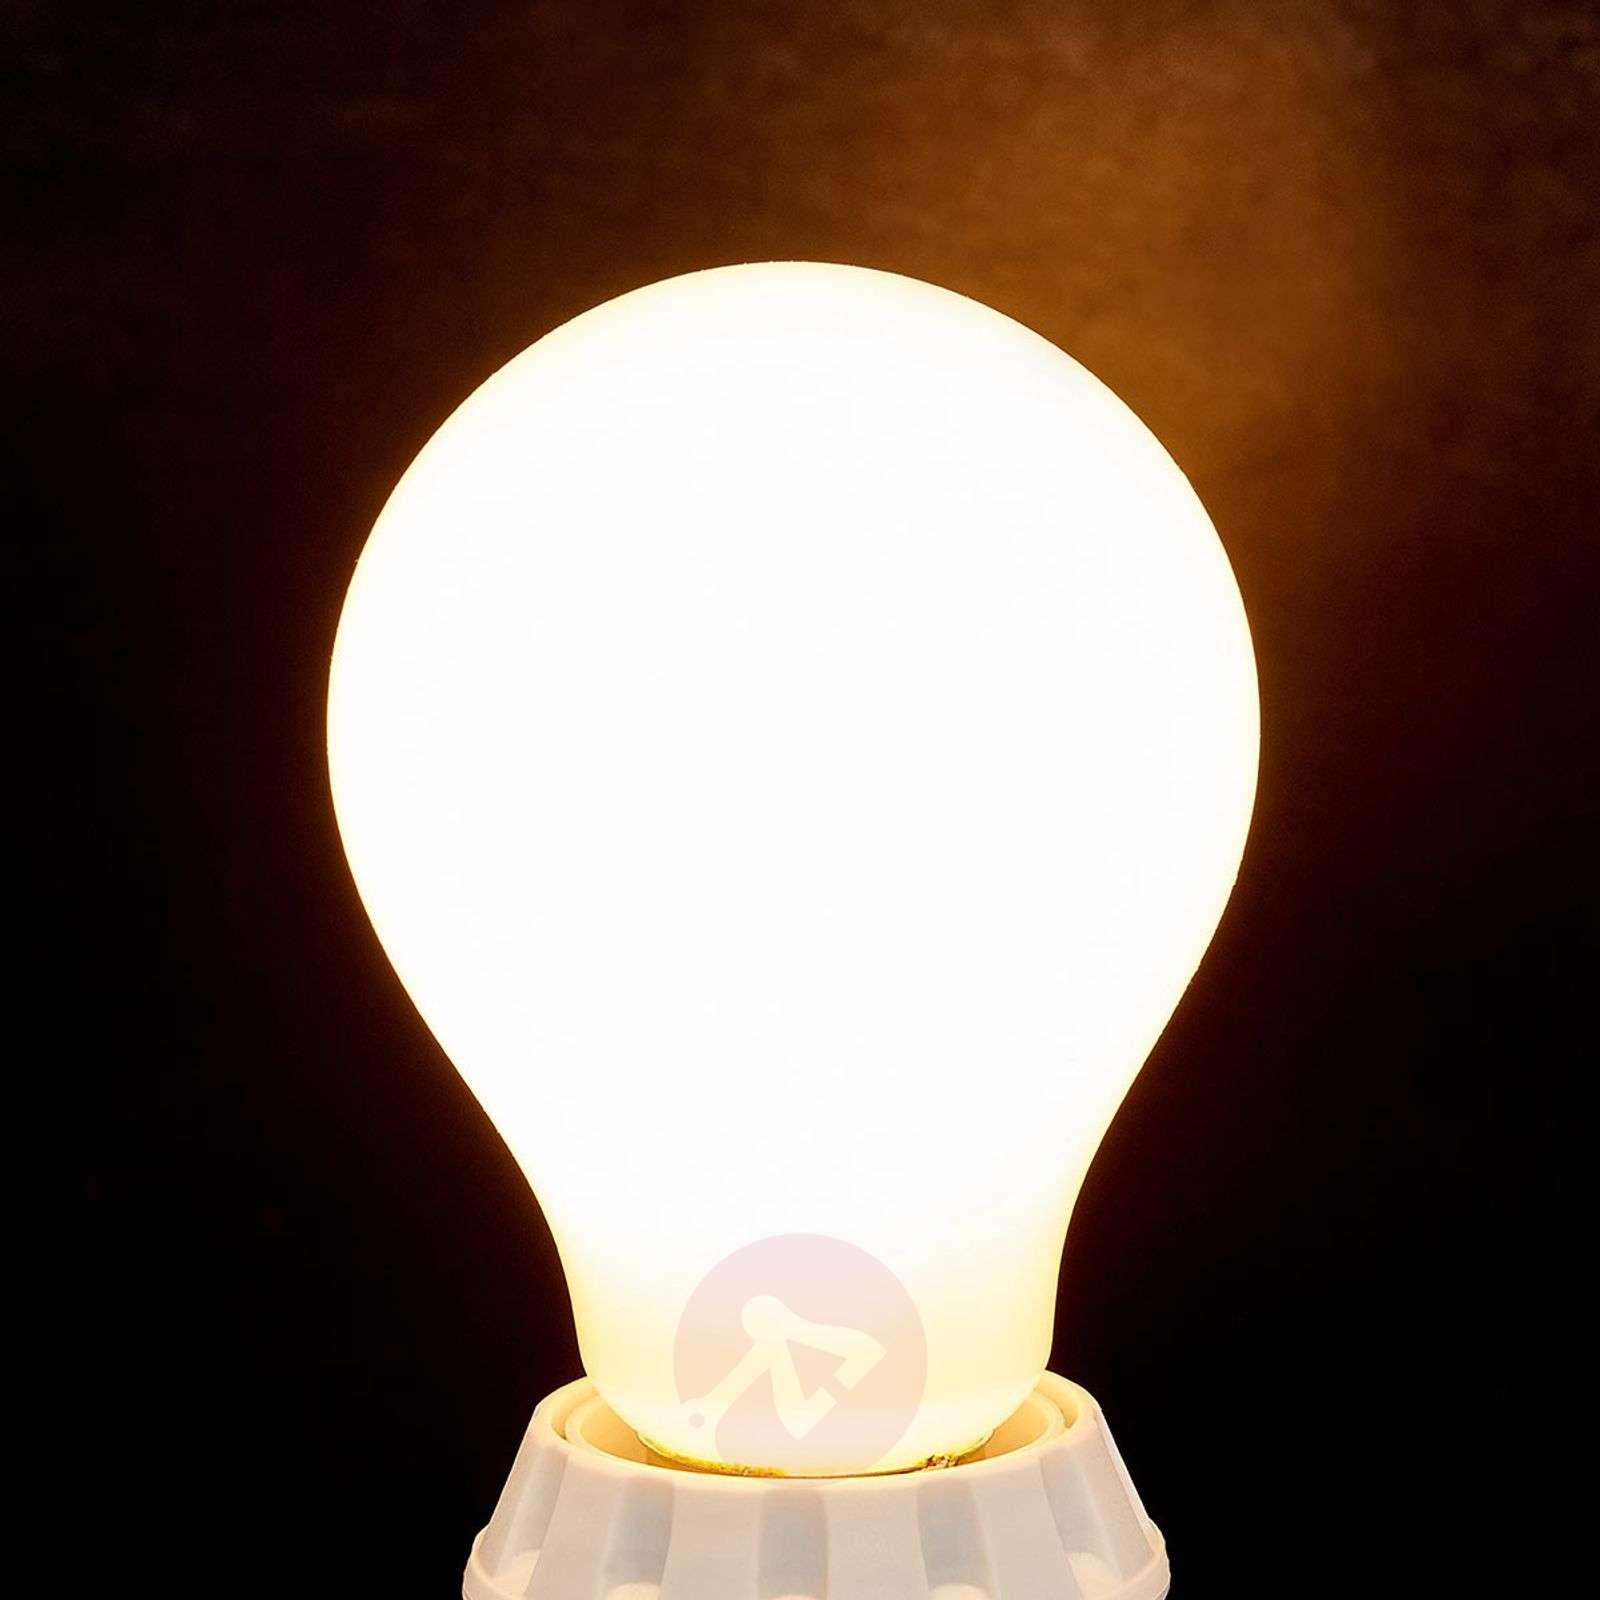 E27-LED-filamenttilamppu 8W 1055 lm 2700 K opaali-9993038-01